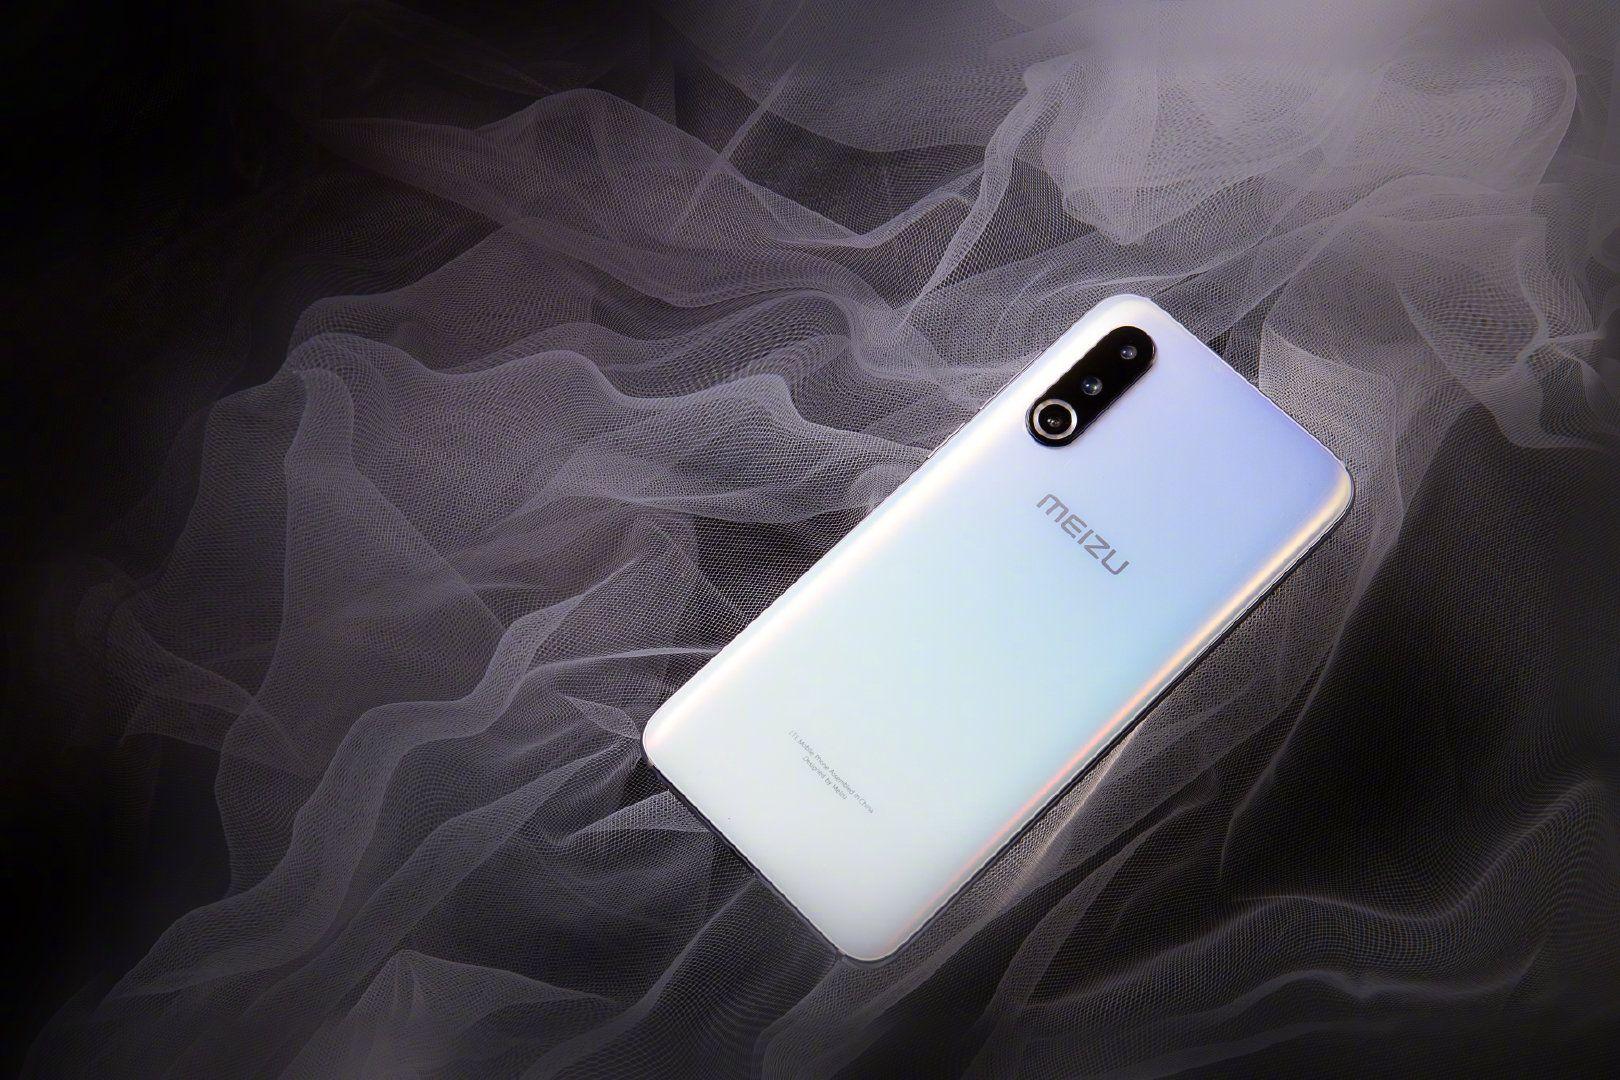 MeizuがQualcomm Snapdragon 865 5Gを搭載した製品、Meizu 17を春に発表すると予告